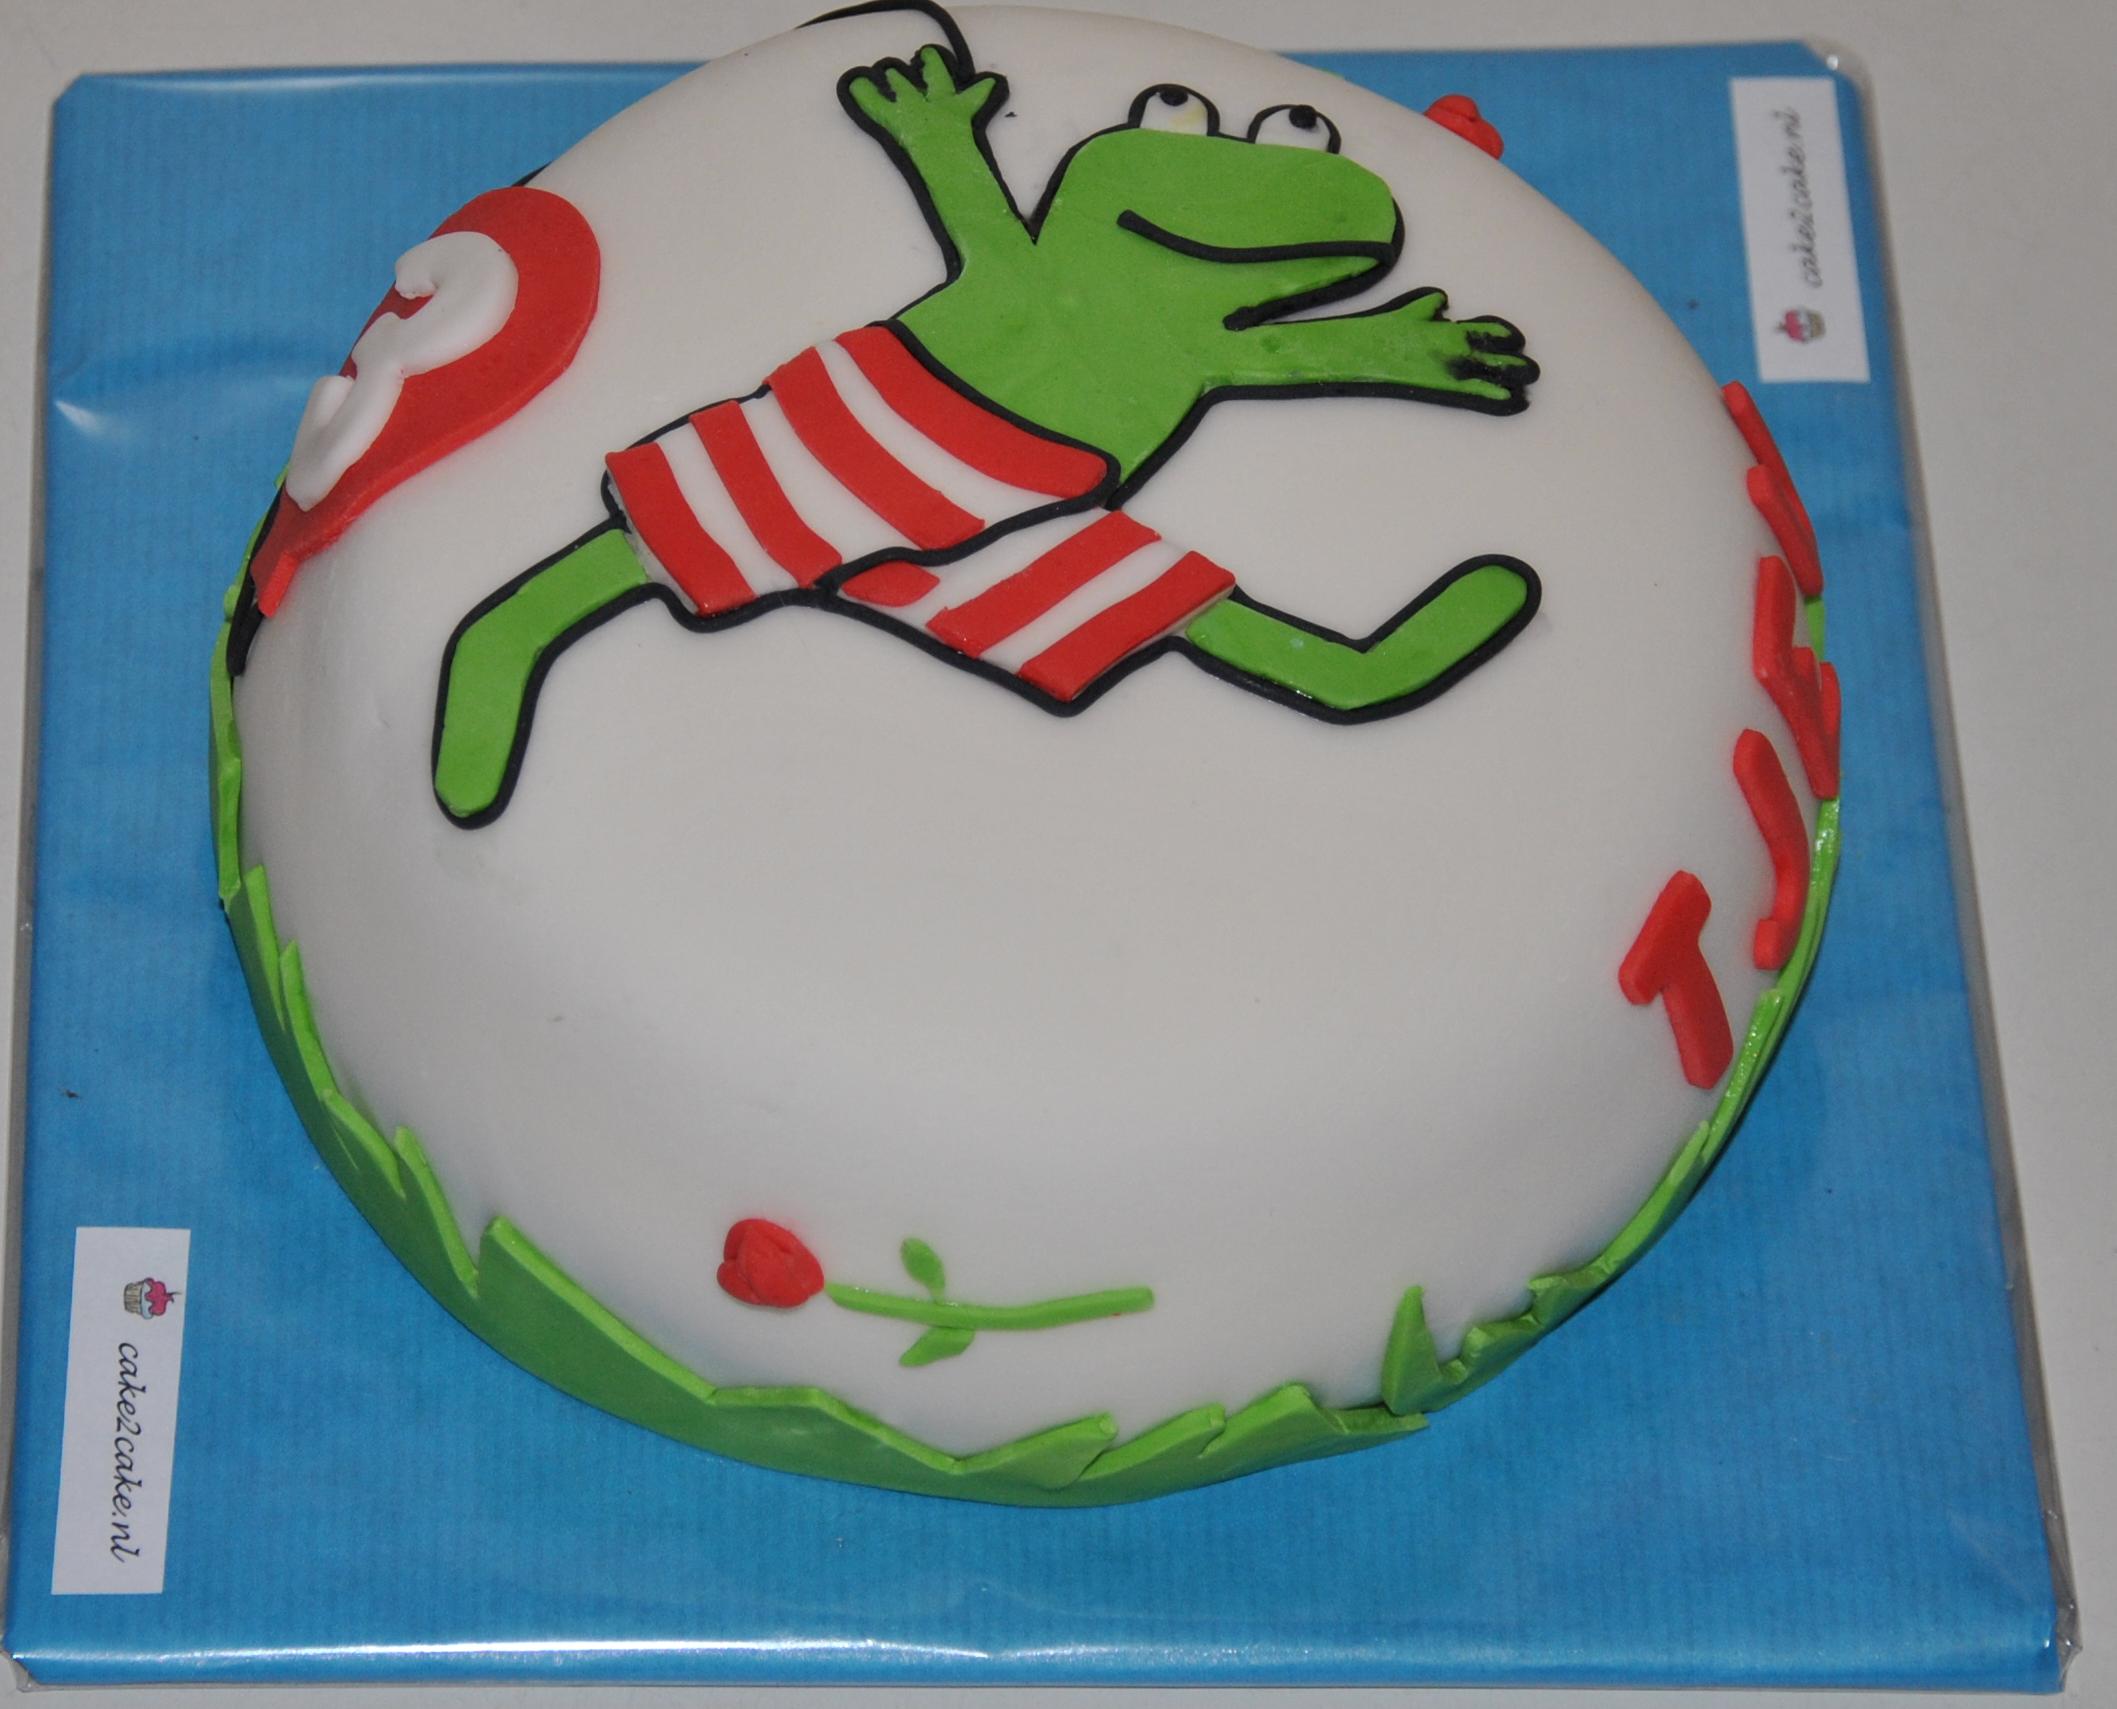 Caketocake Nl Cake Taarten Cupcakes En Cakepops Op Bestelling